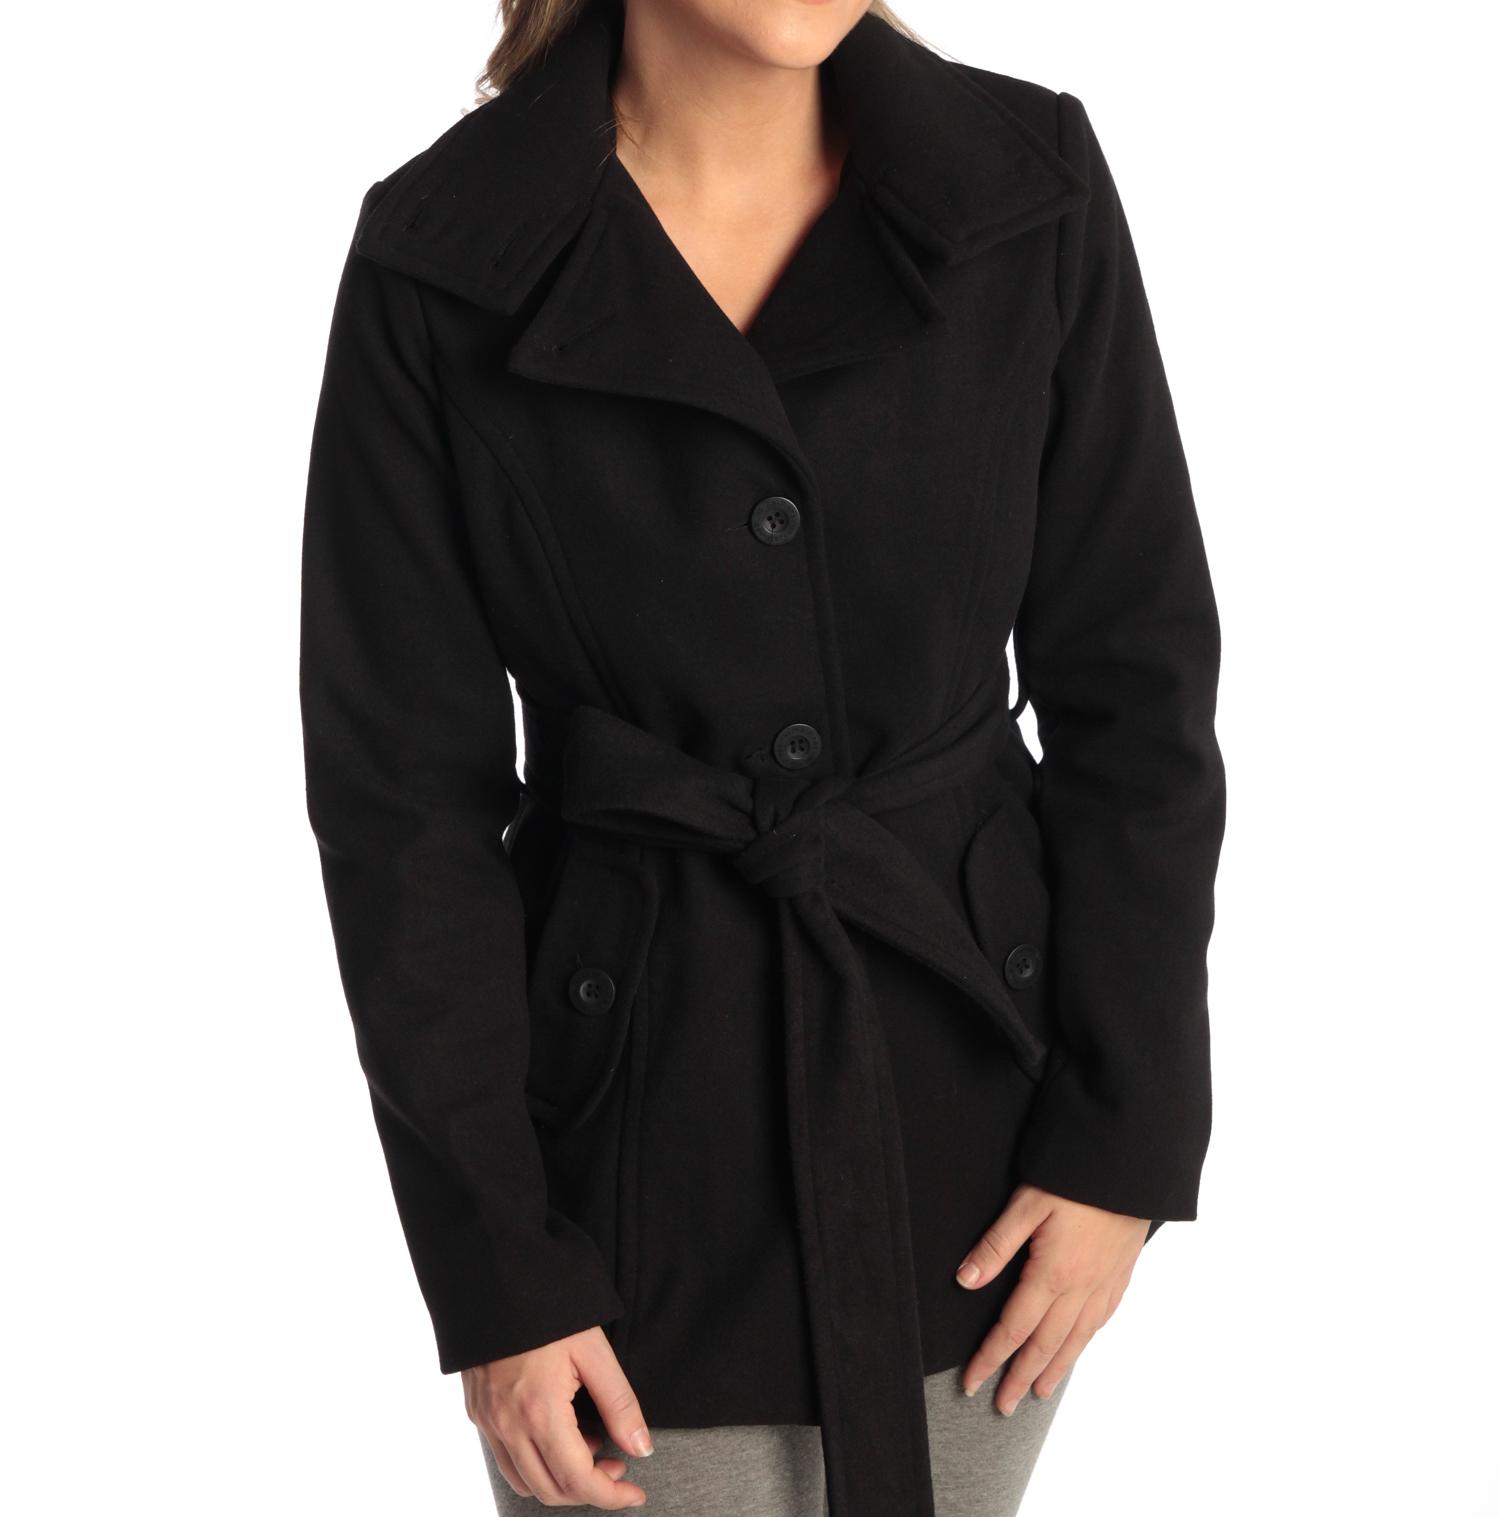 Alpine Swiss Bella Women's Belted Blazer Button Up Wool Coat $26.50 + Free Shipping